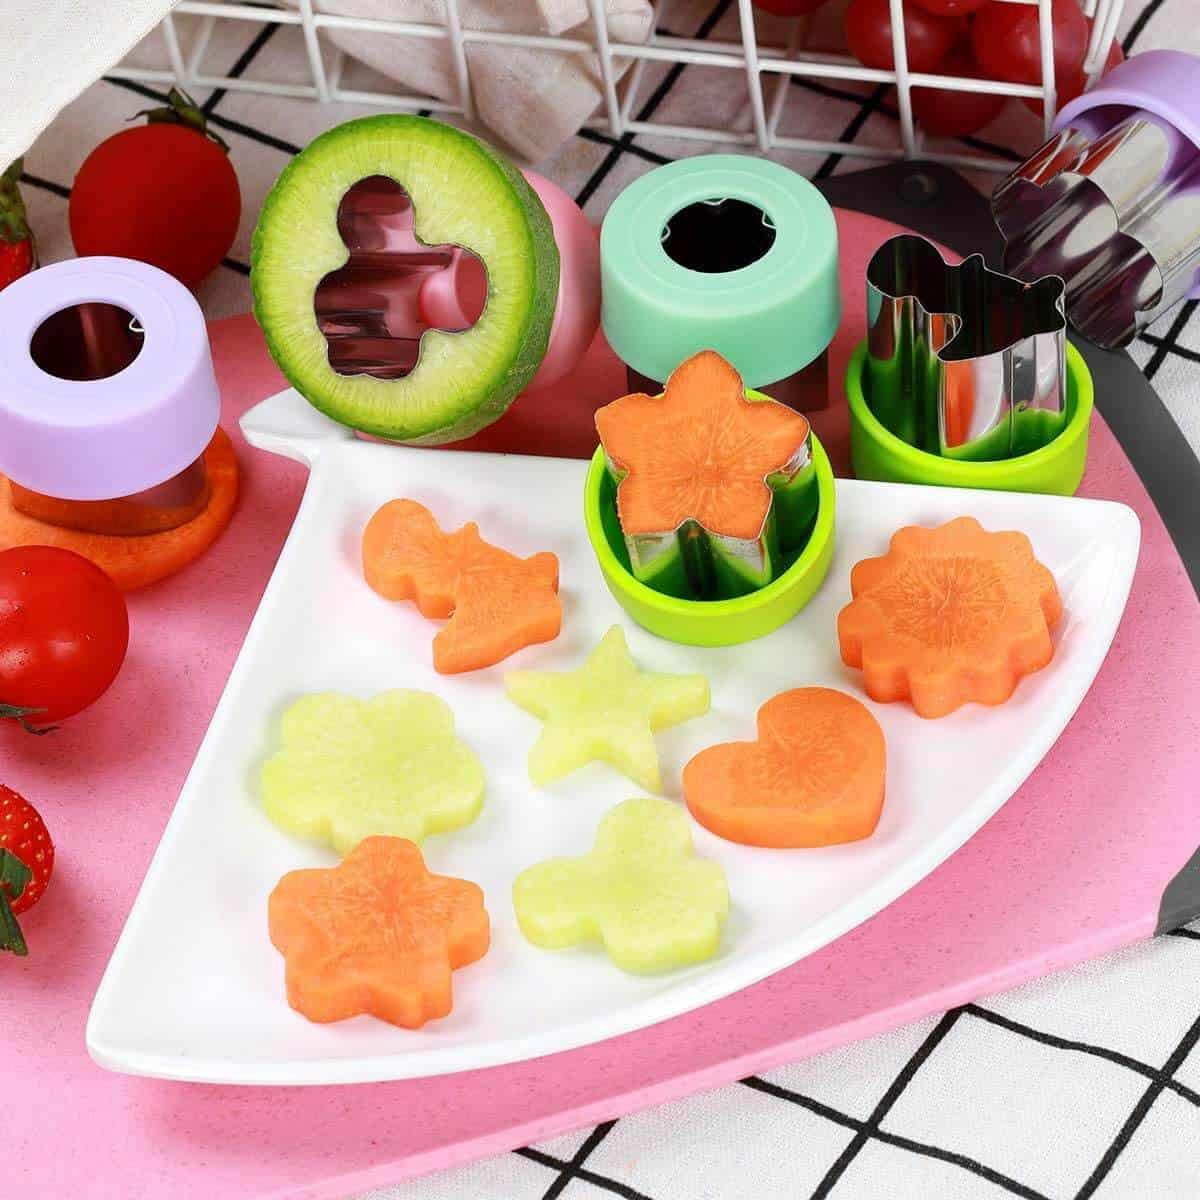 StarPack Vegetable Cutter Shapes